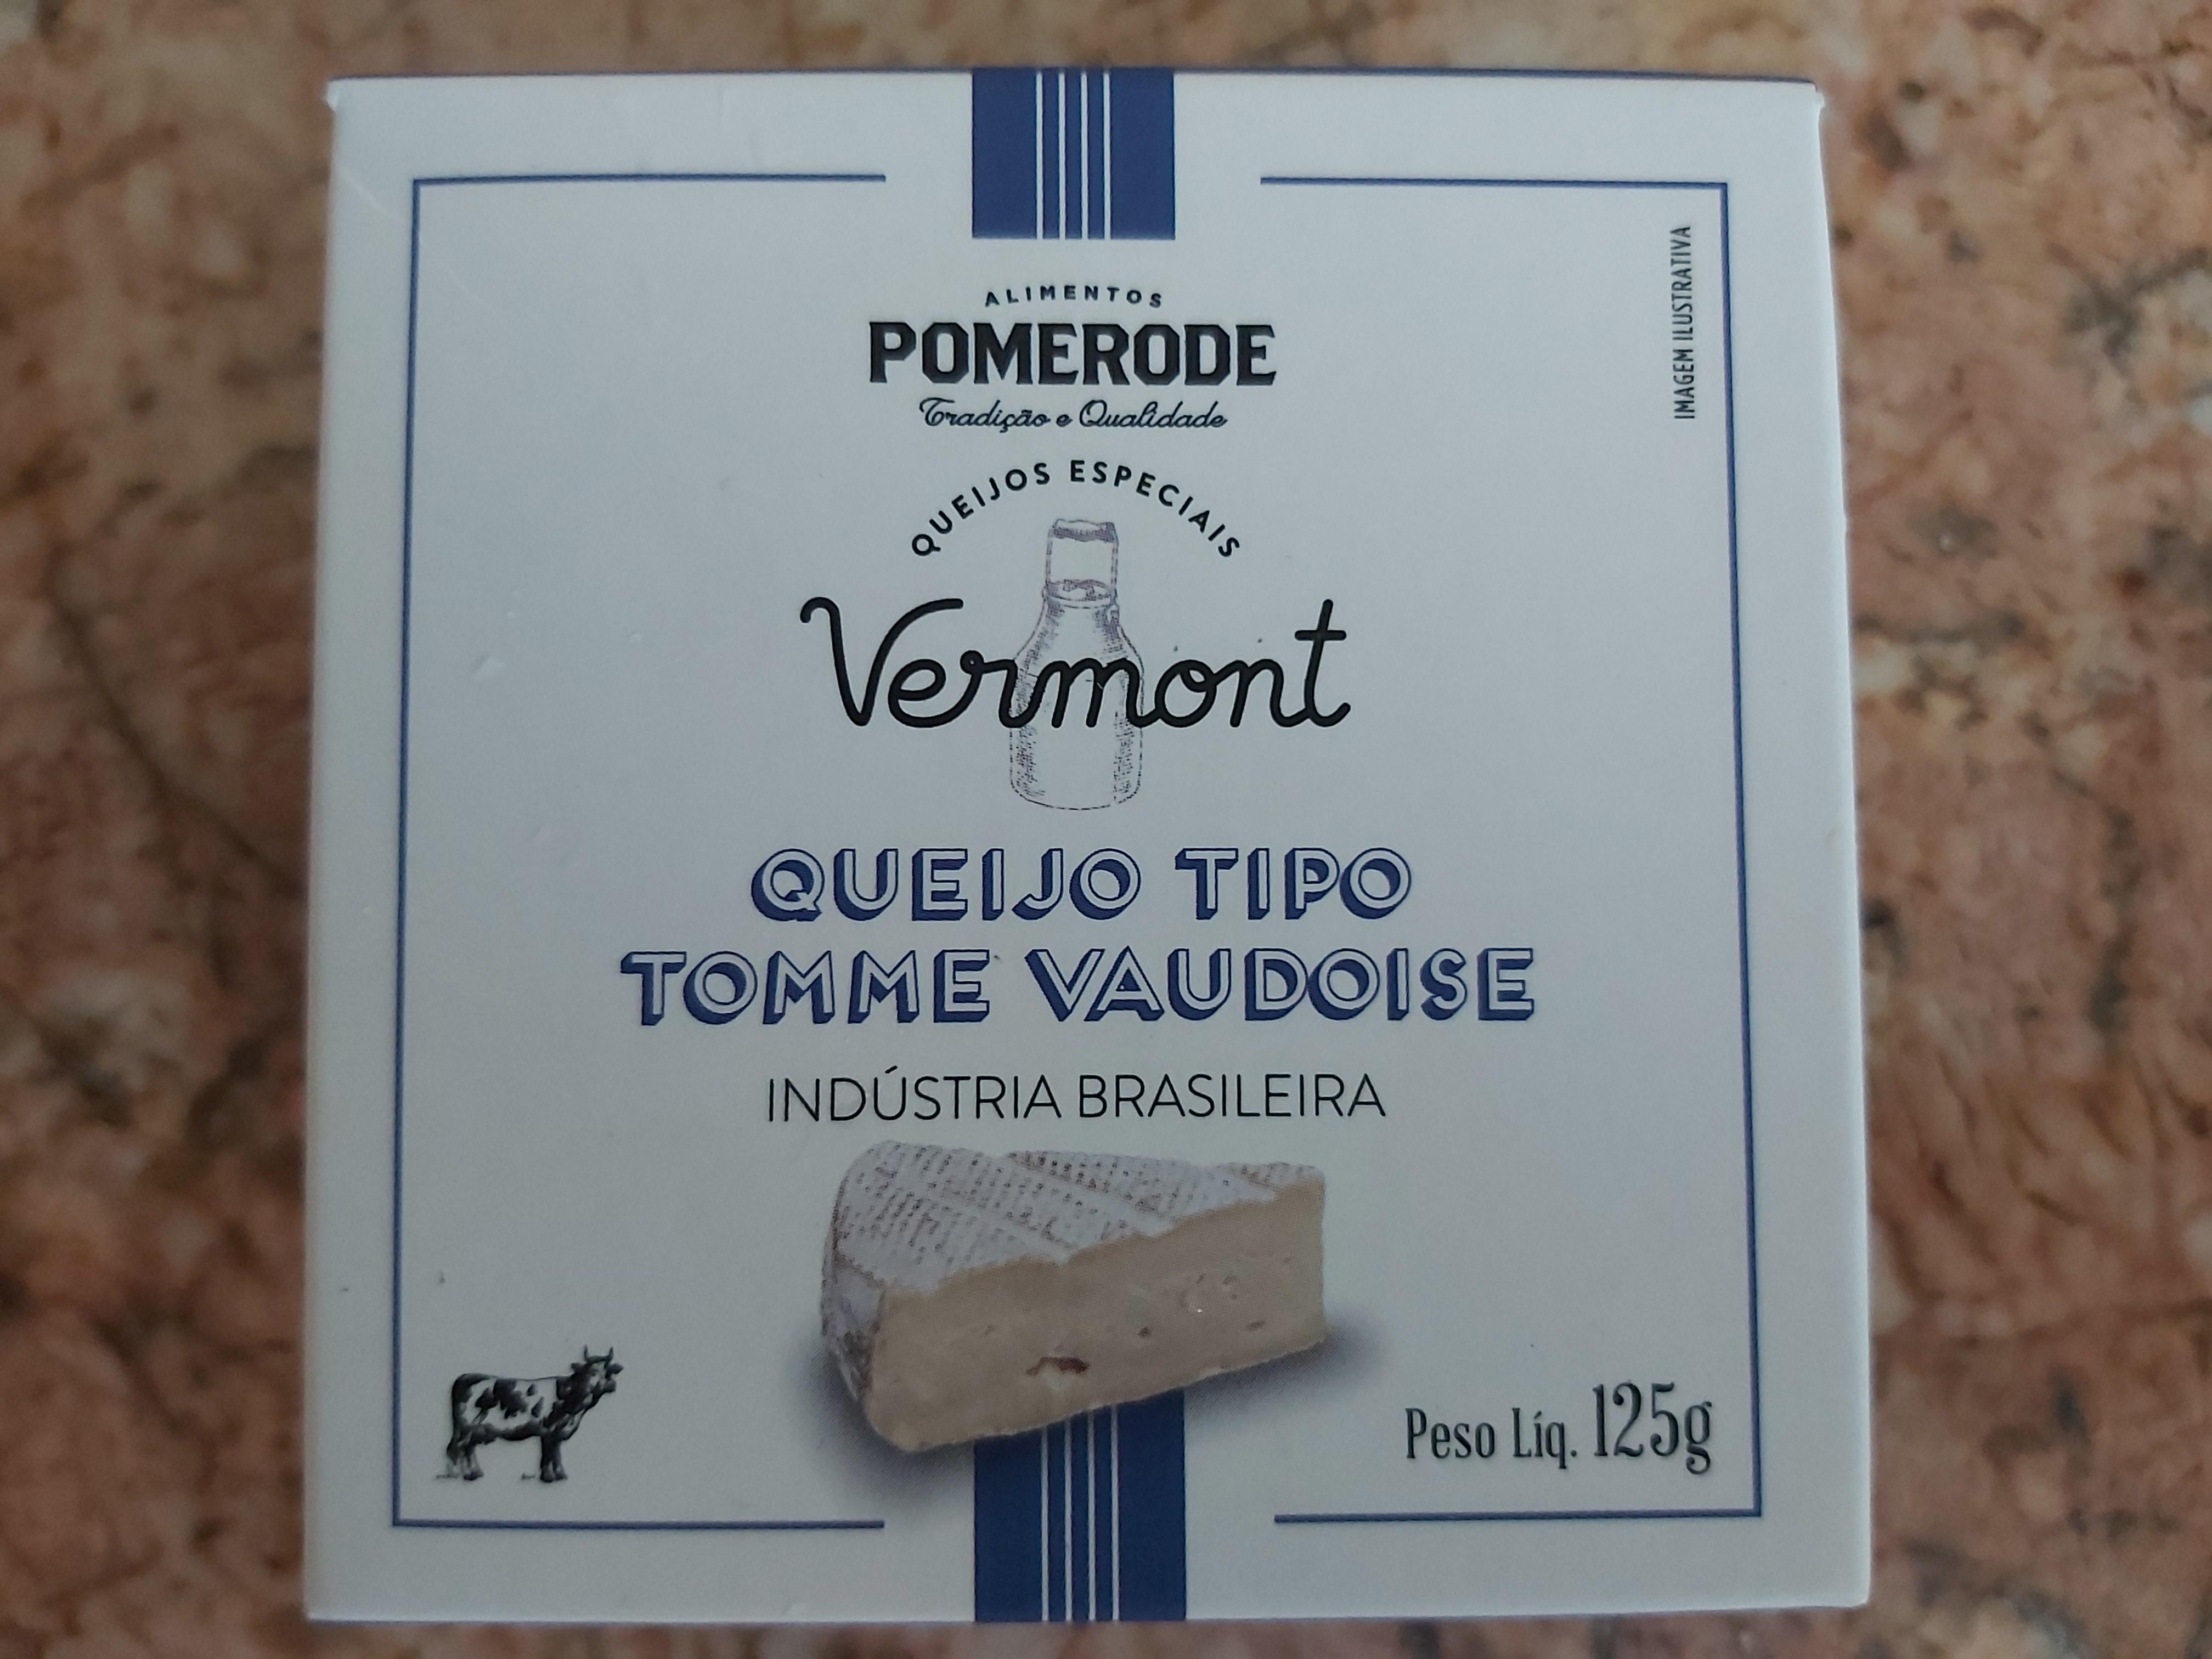 Tomme Vaudoise Vermont